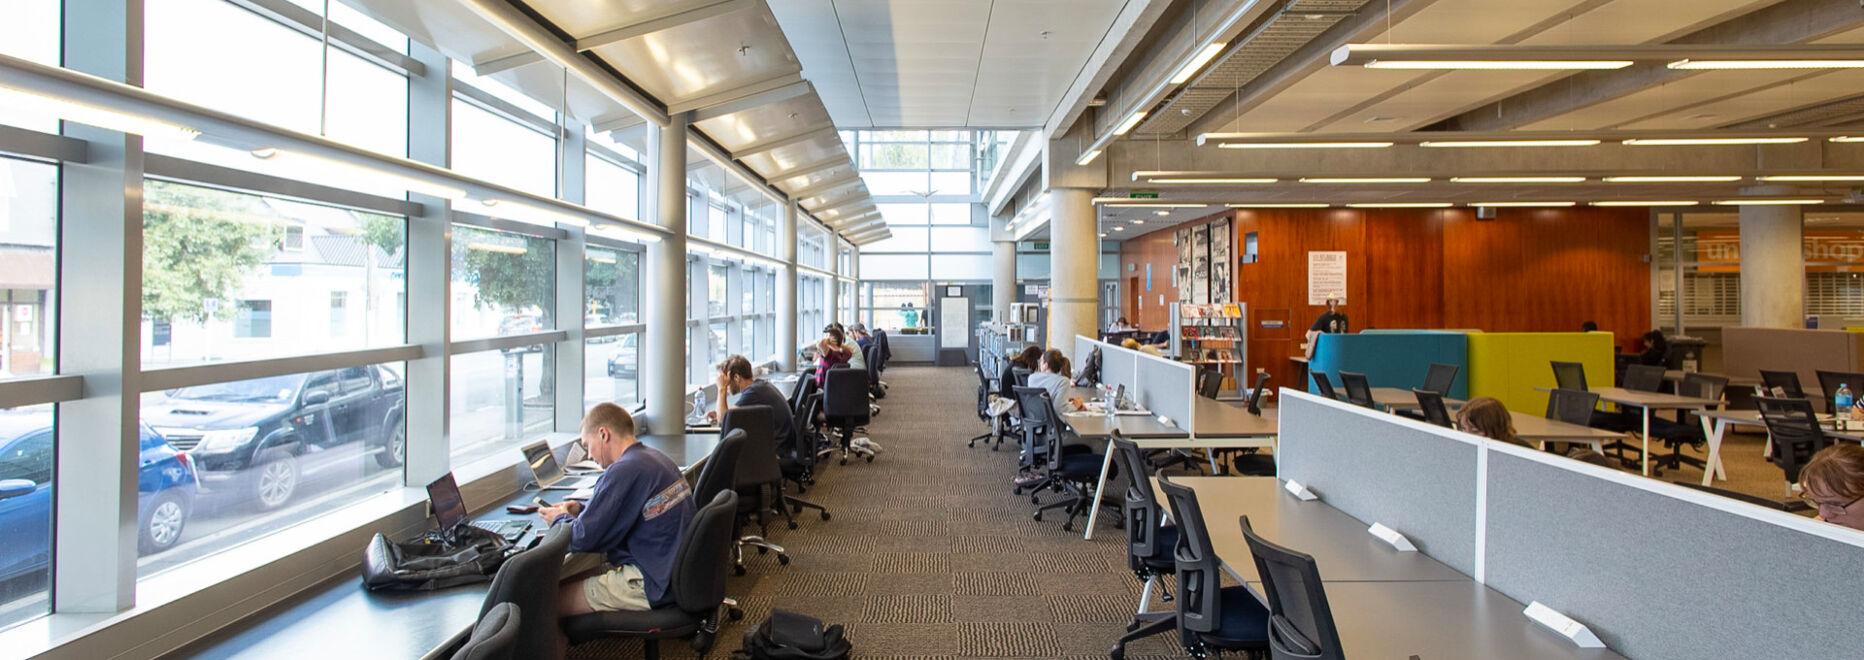 projects university otago isb